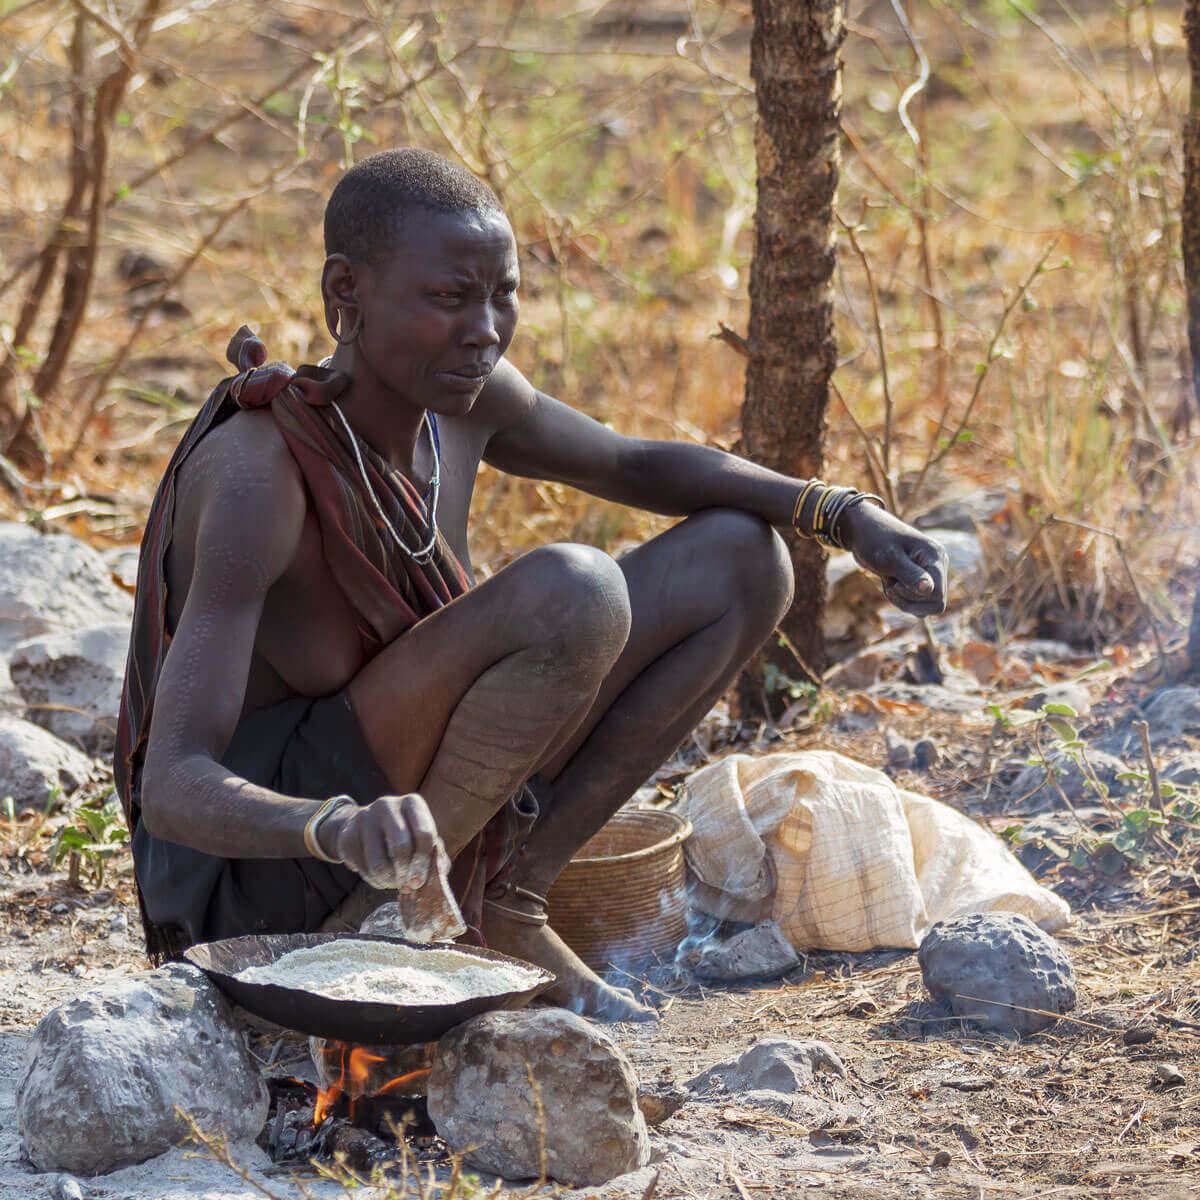 Ethiopia_Mursi_tribe_women_makingdinner_traveling_village_family_tour_visiting_Jinka_Omovalley_adventuresinethiopia